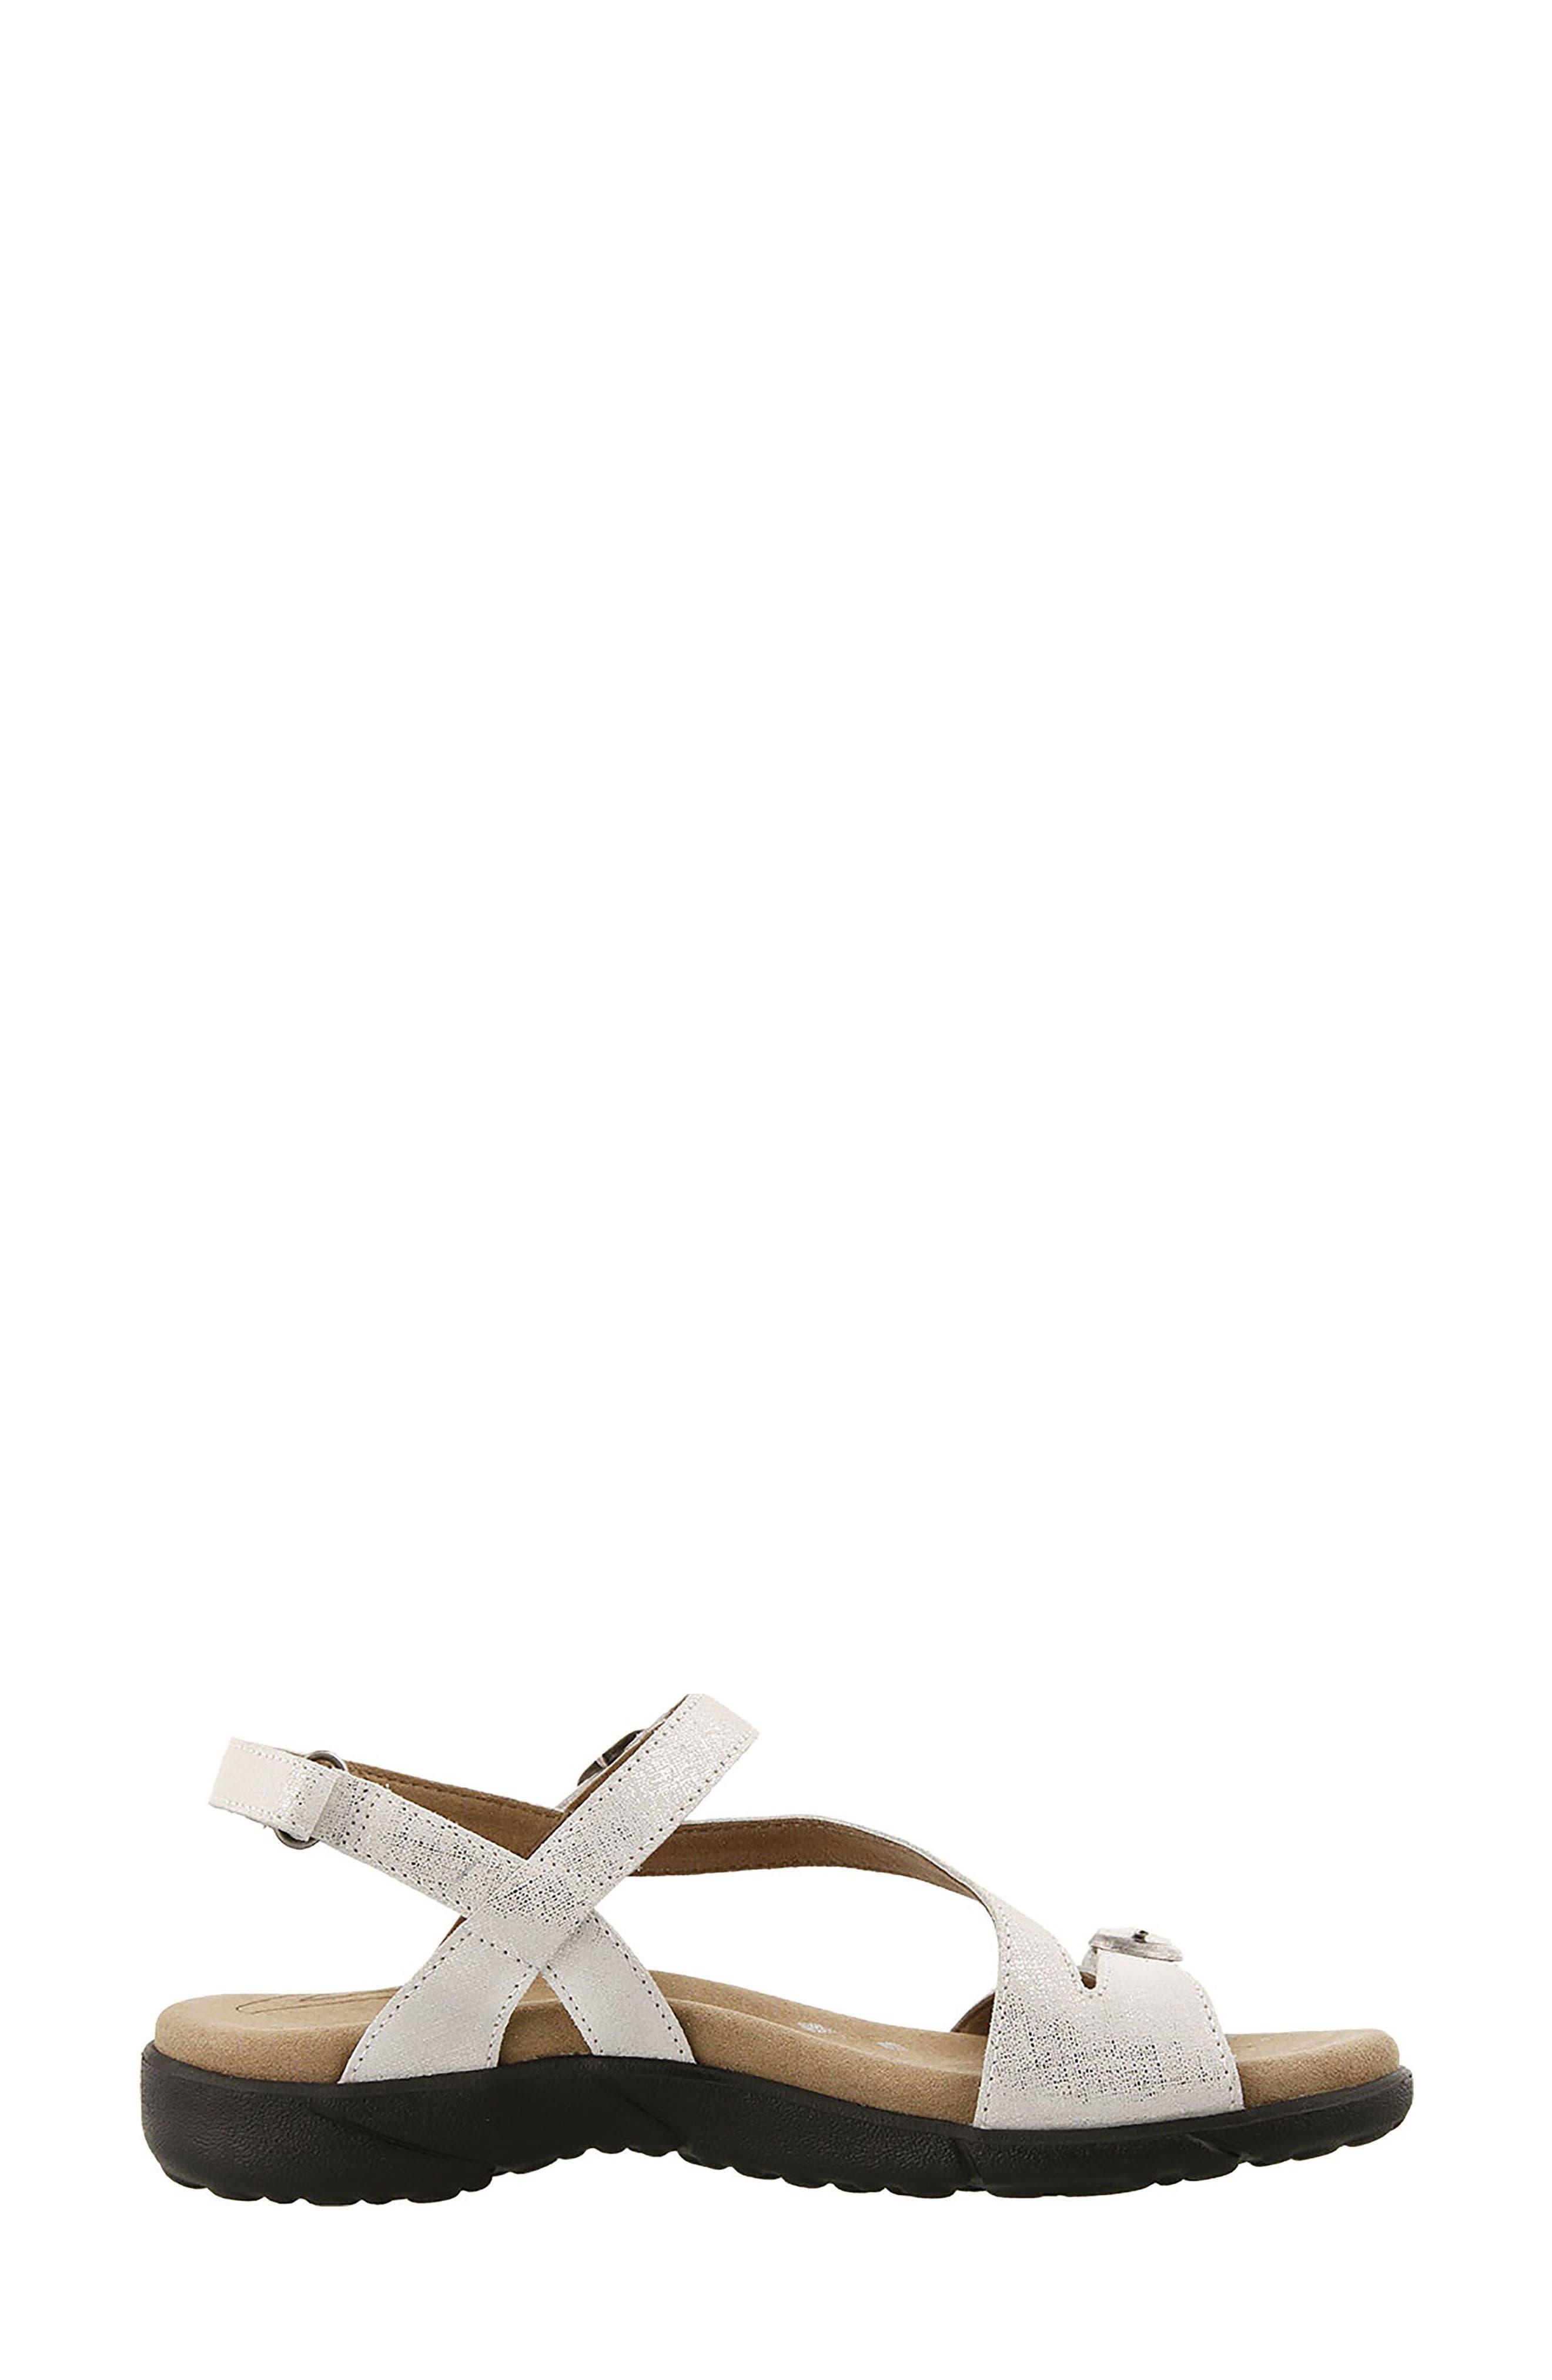 Beauty Sandal,                             Alternate thumbnail 3, color,                             White Metallic Leather